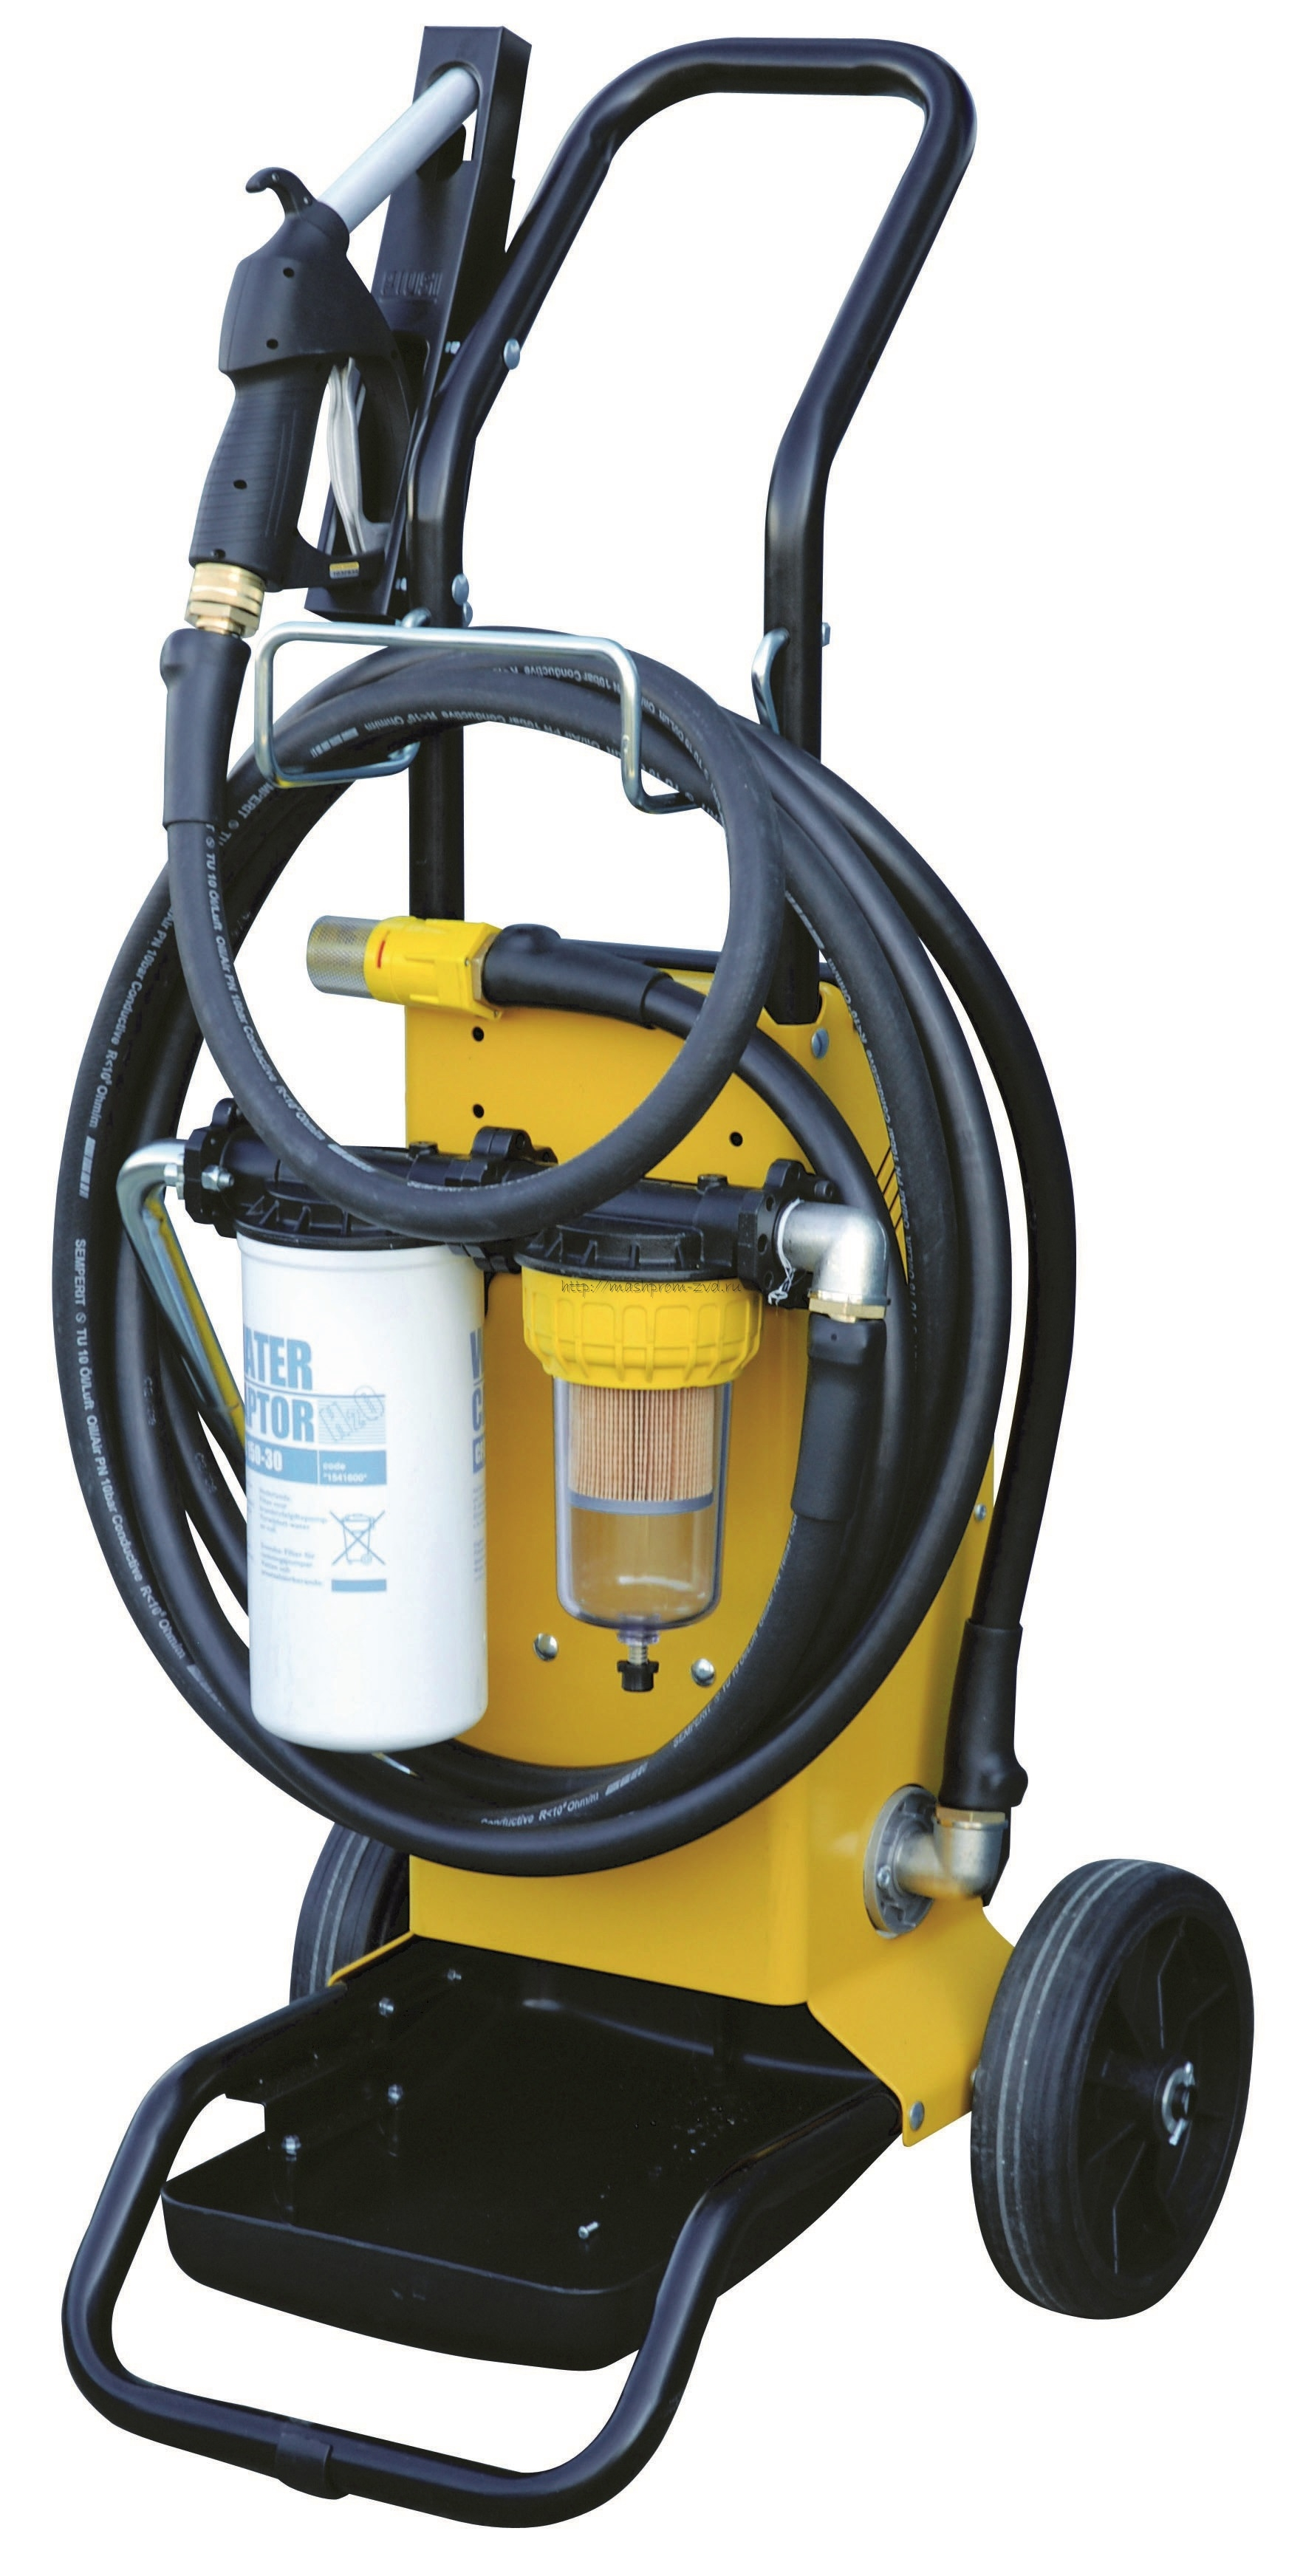 Filtroll Diesel арт. F00506000 - Фильтрующий блок для дизельного топлива